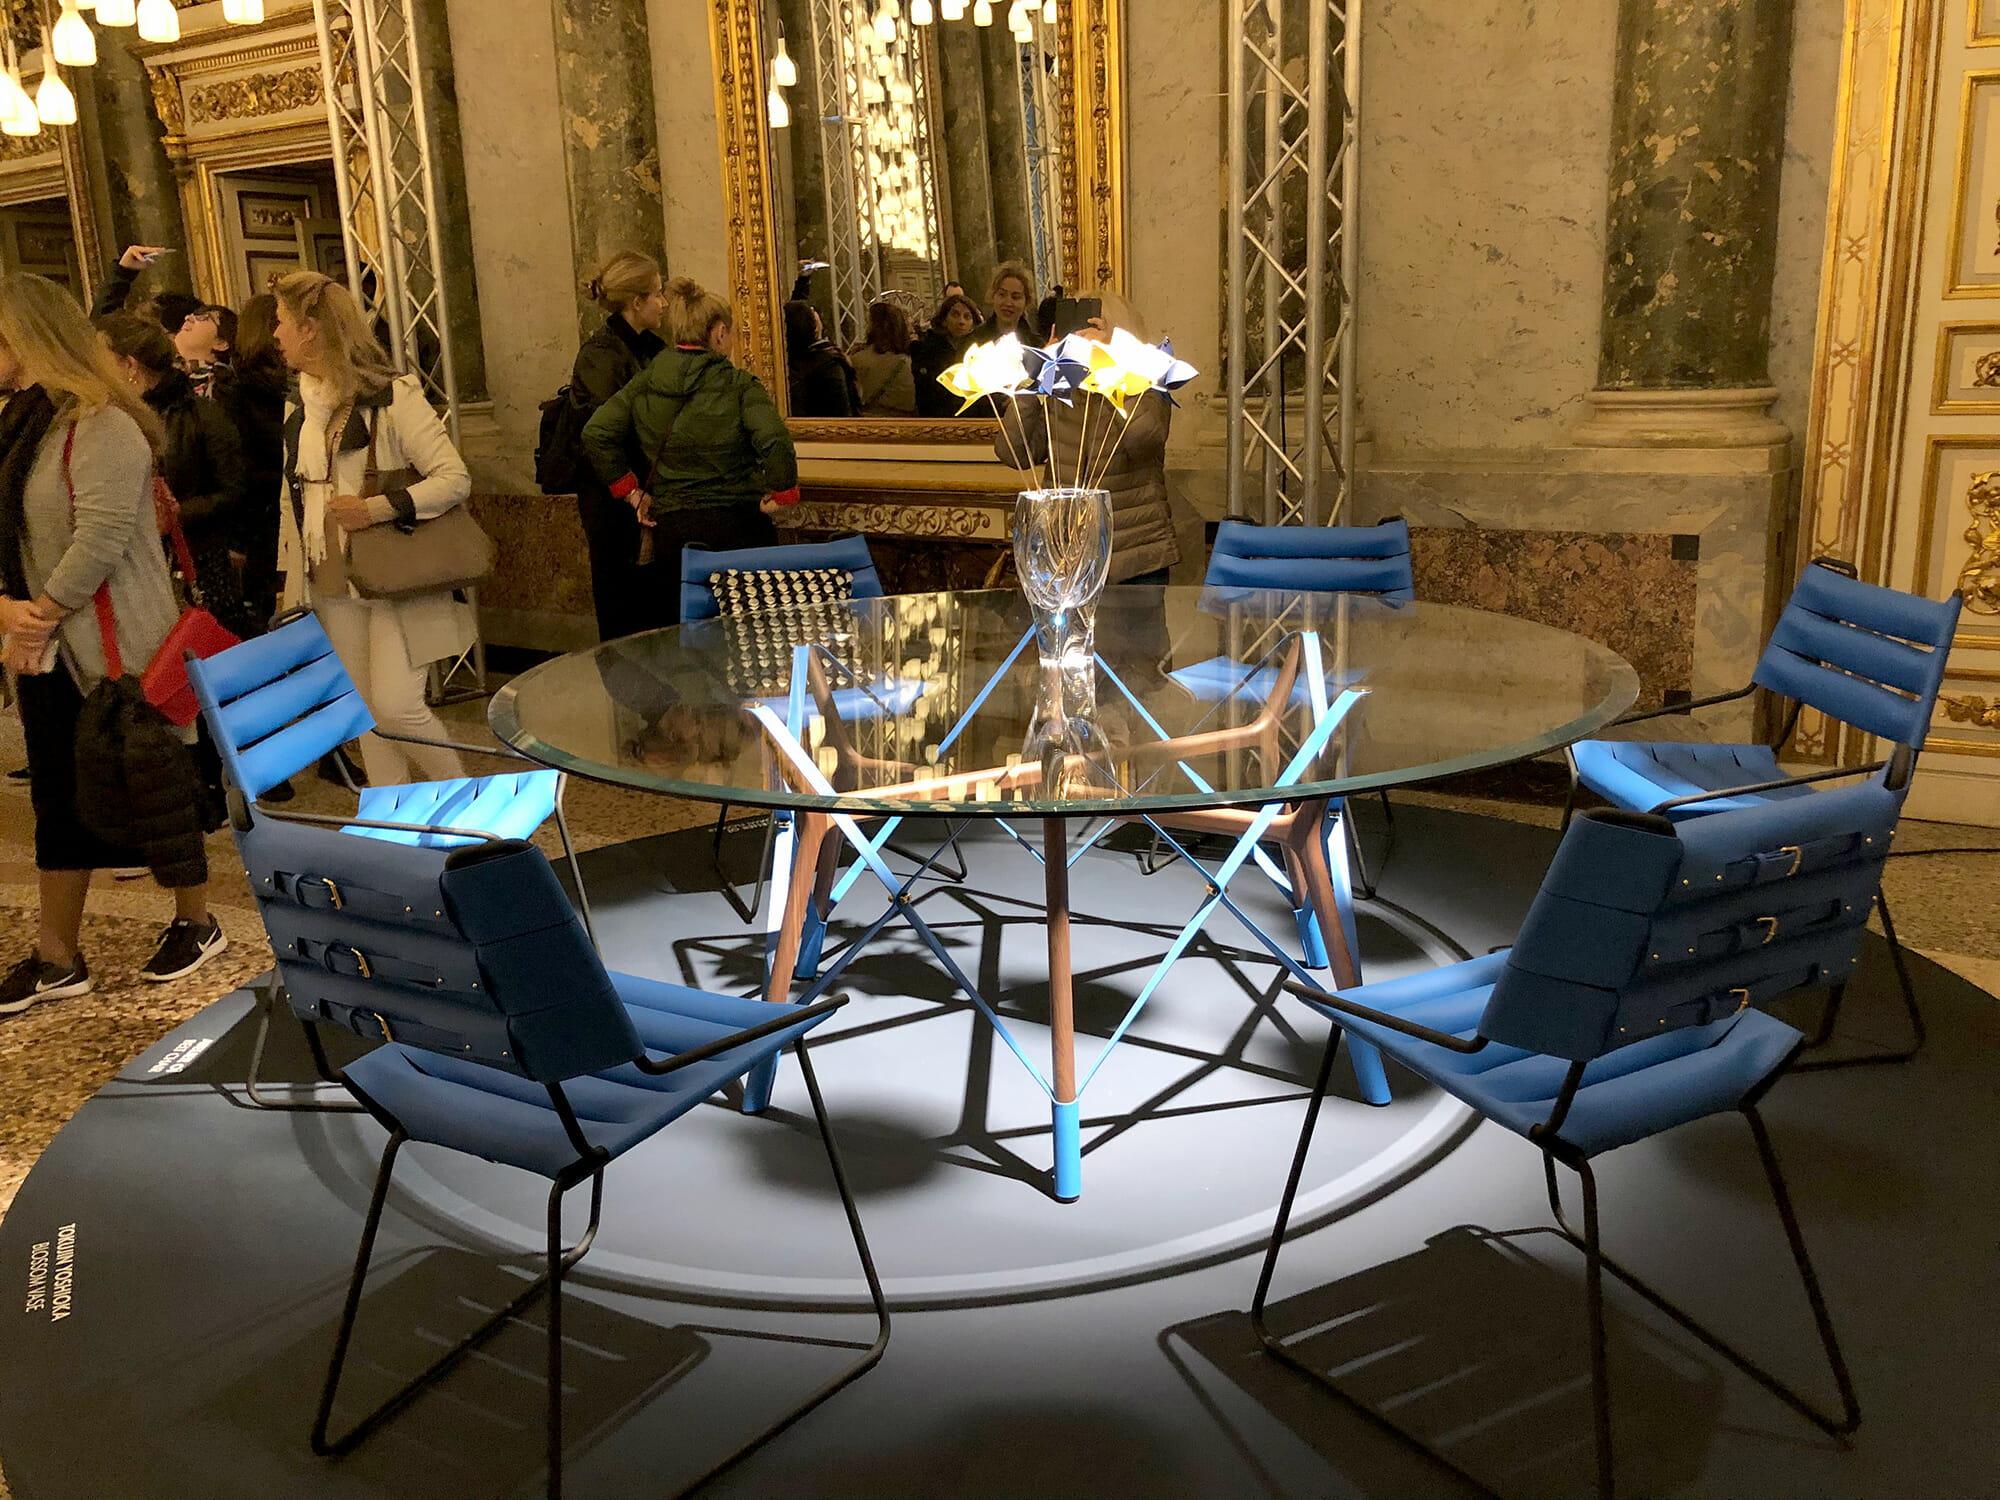 LOUIS VUITTON「オブジェ・ノマド コレクション」、ミラノデザインウィーク定番の展示の一つとなっている、吉岡徳仁さんのフラワーベースとそこに飾られたアトリエ・オイによる花のオブジェ、テーブルと椅子、クッションもアトリエ・オイによるデザイン